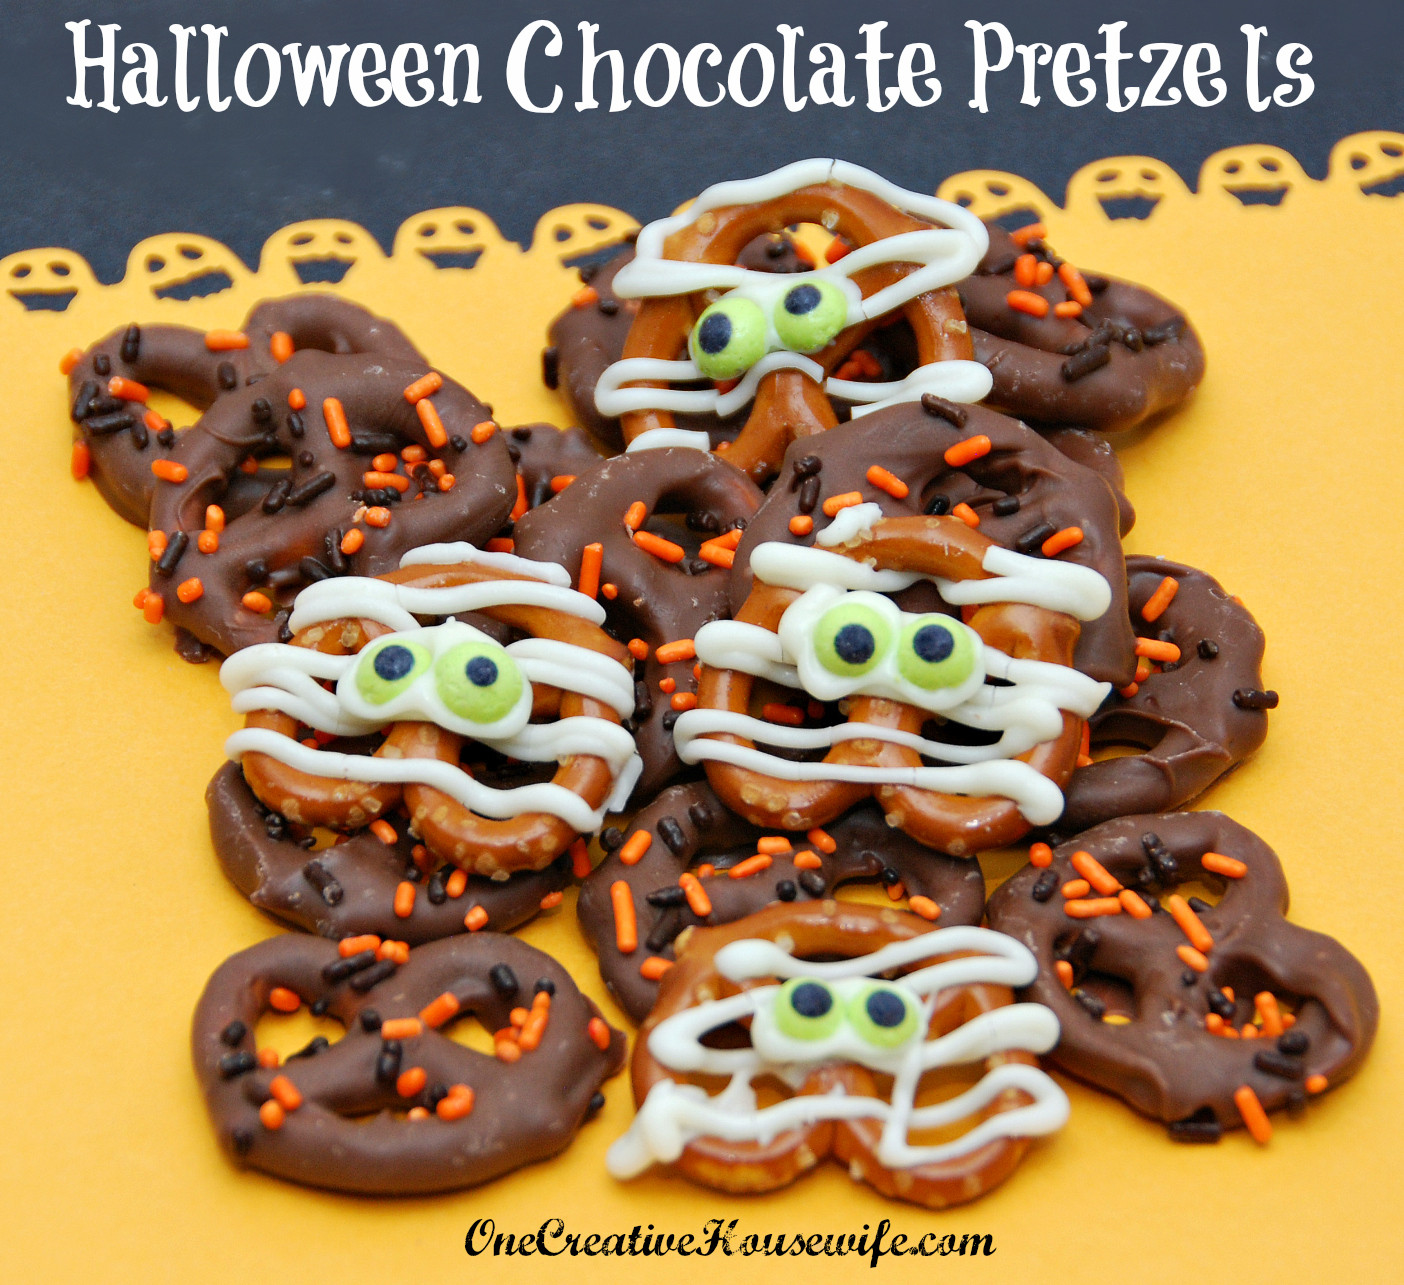 Halloween Chocolate Covered Pretzels  e Creative Housewife Halloween Chocolate Covered Pretzels